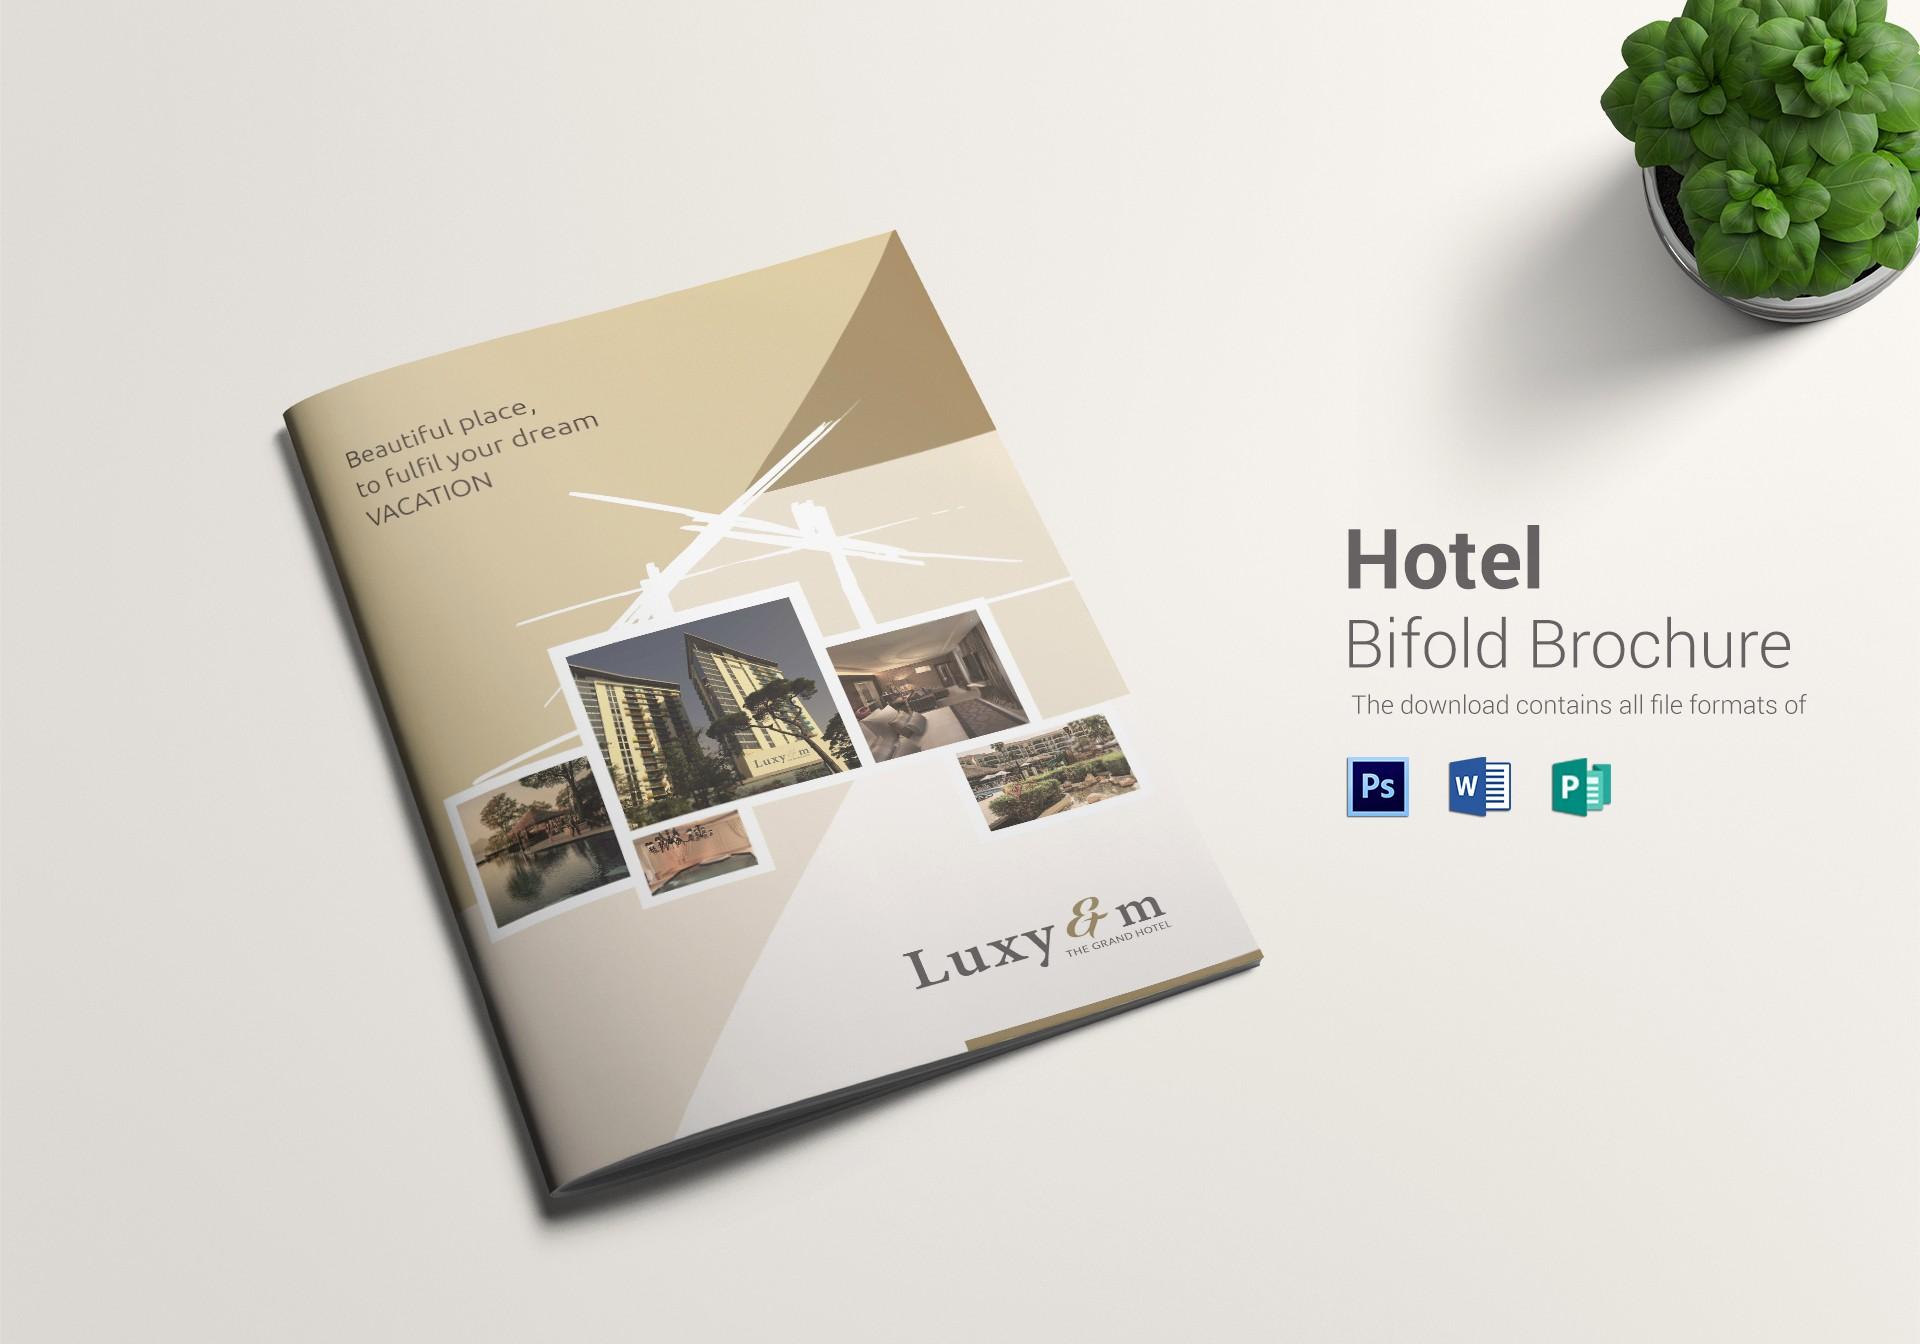 Bi Fold Brochure Templates Free Beautiful Hotel Bi Fold Brochure Design Template In Word Psd Publisher